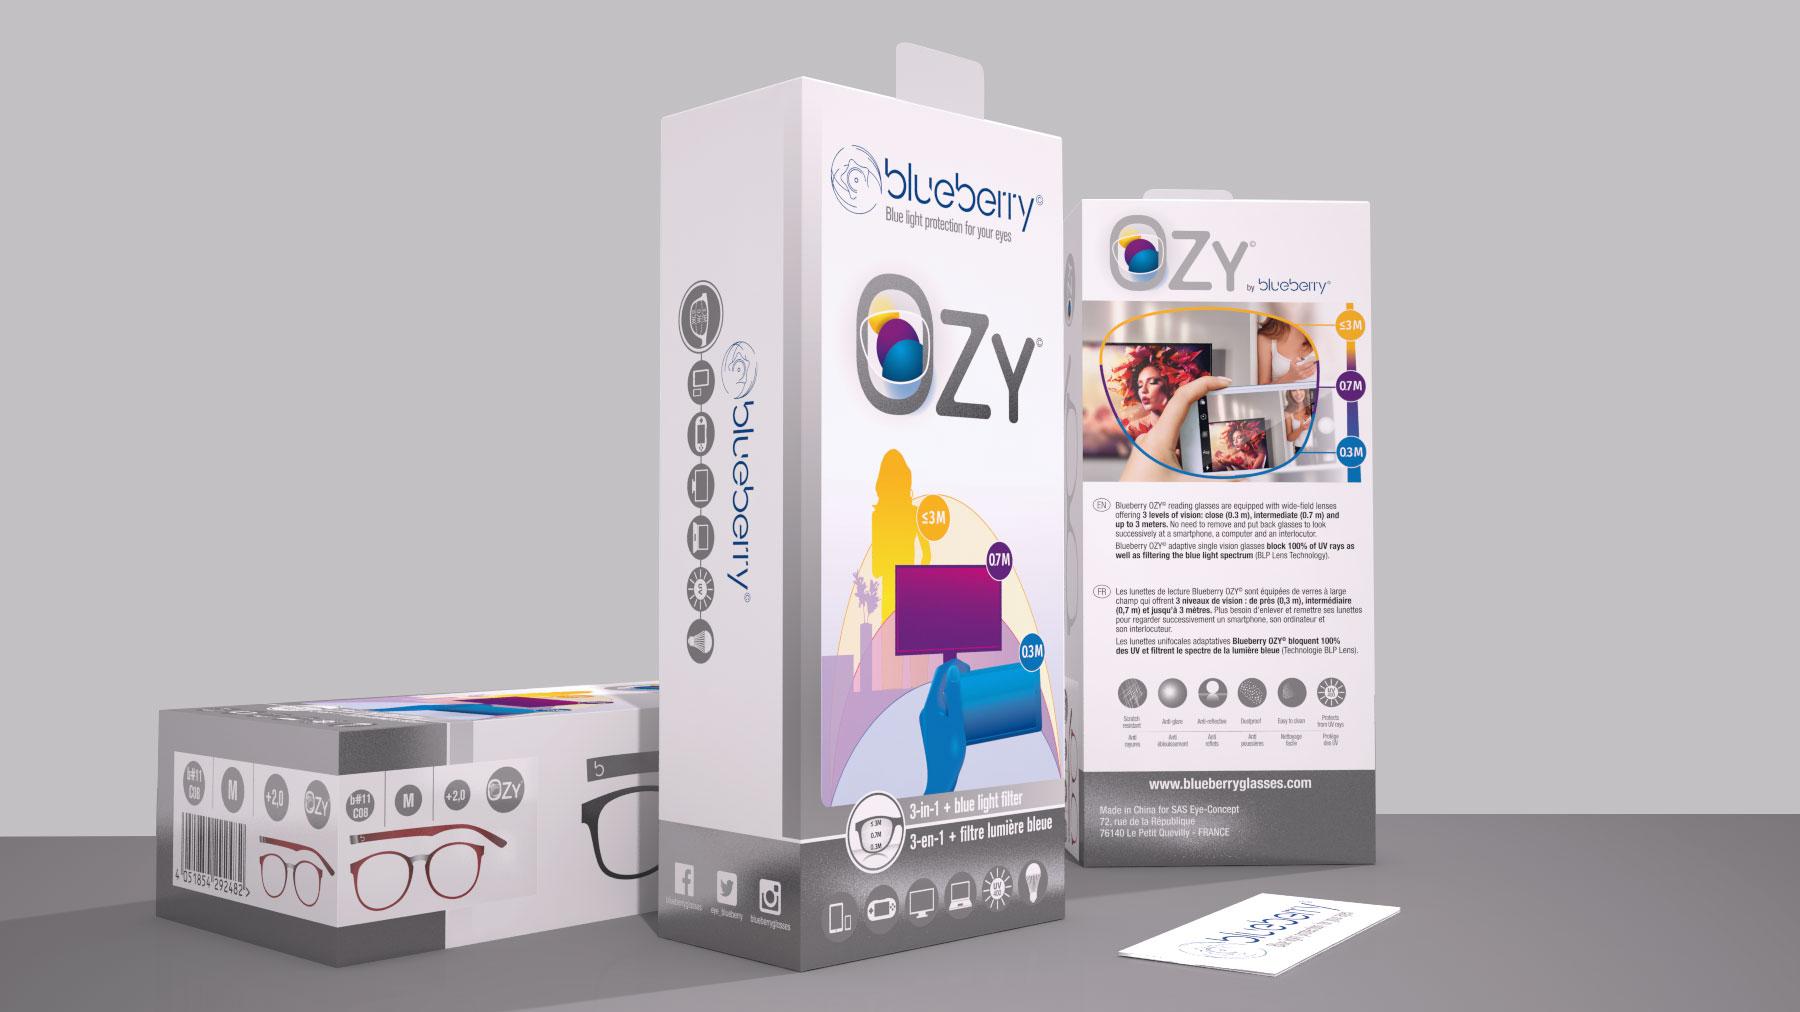 Ozy Blueberry